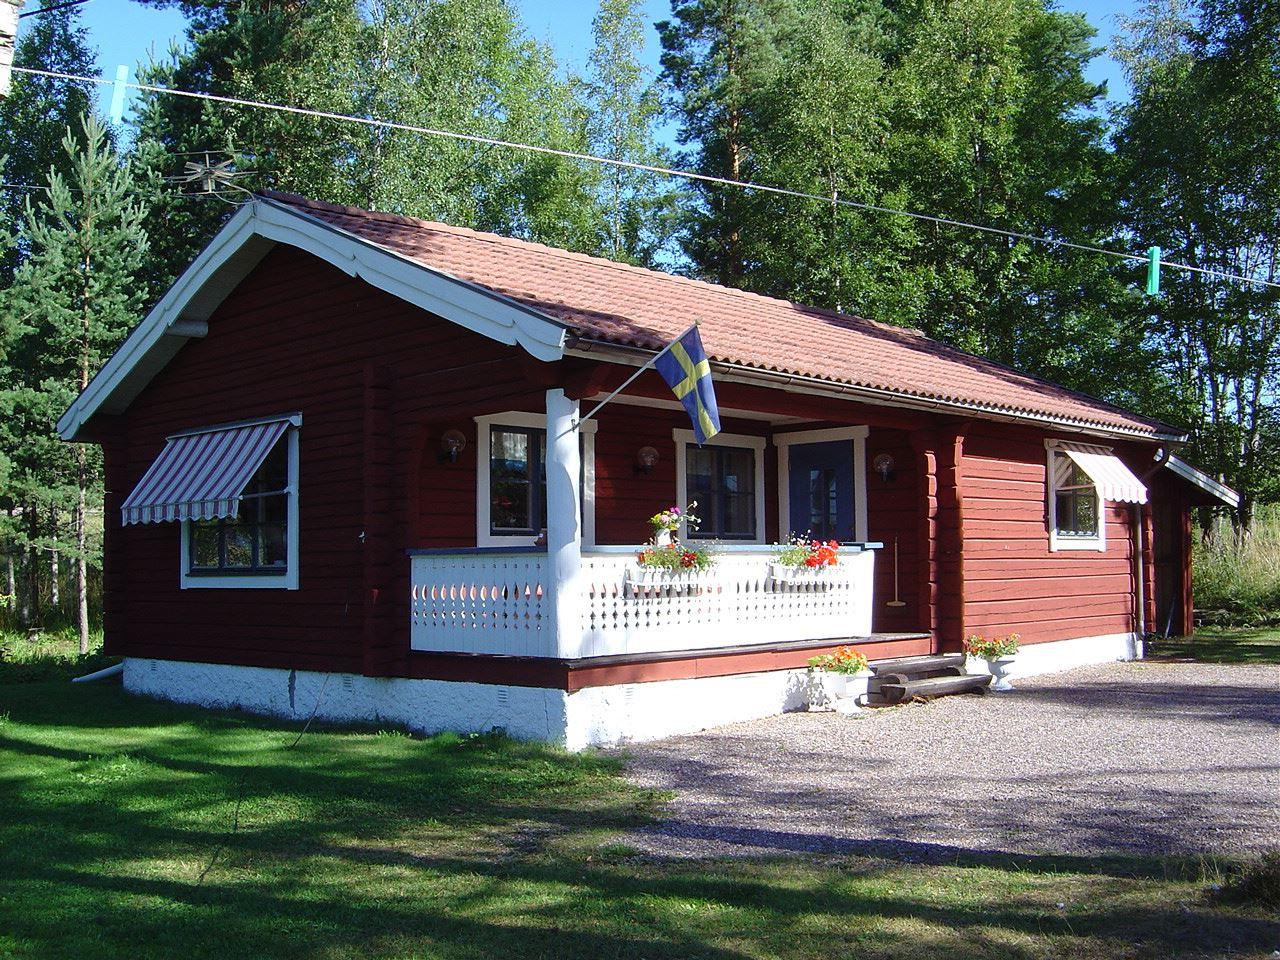 R330 Vikarbyn, 7 km N Rättvik